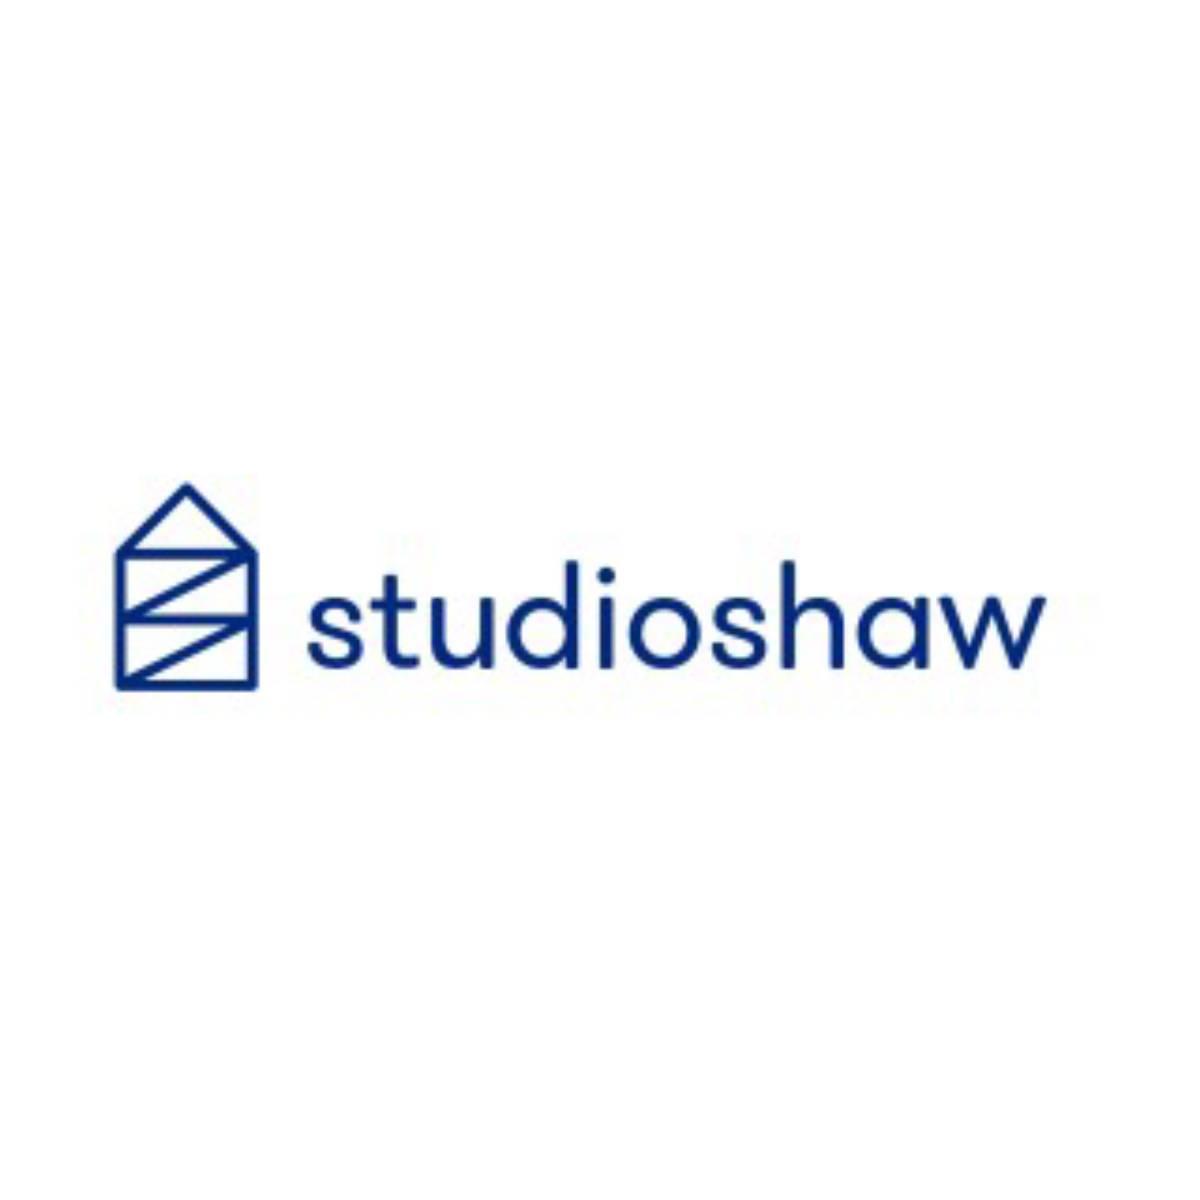 Studio shaw.jpg